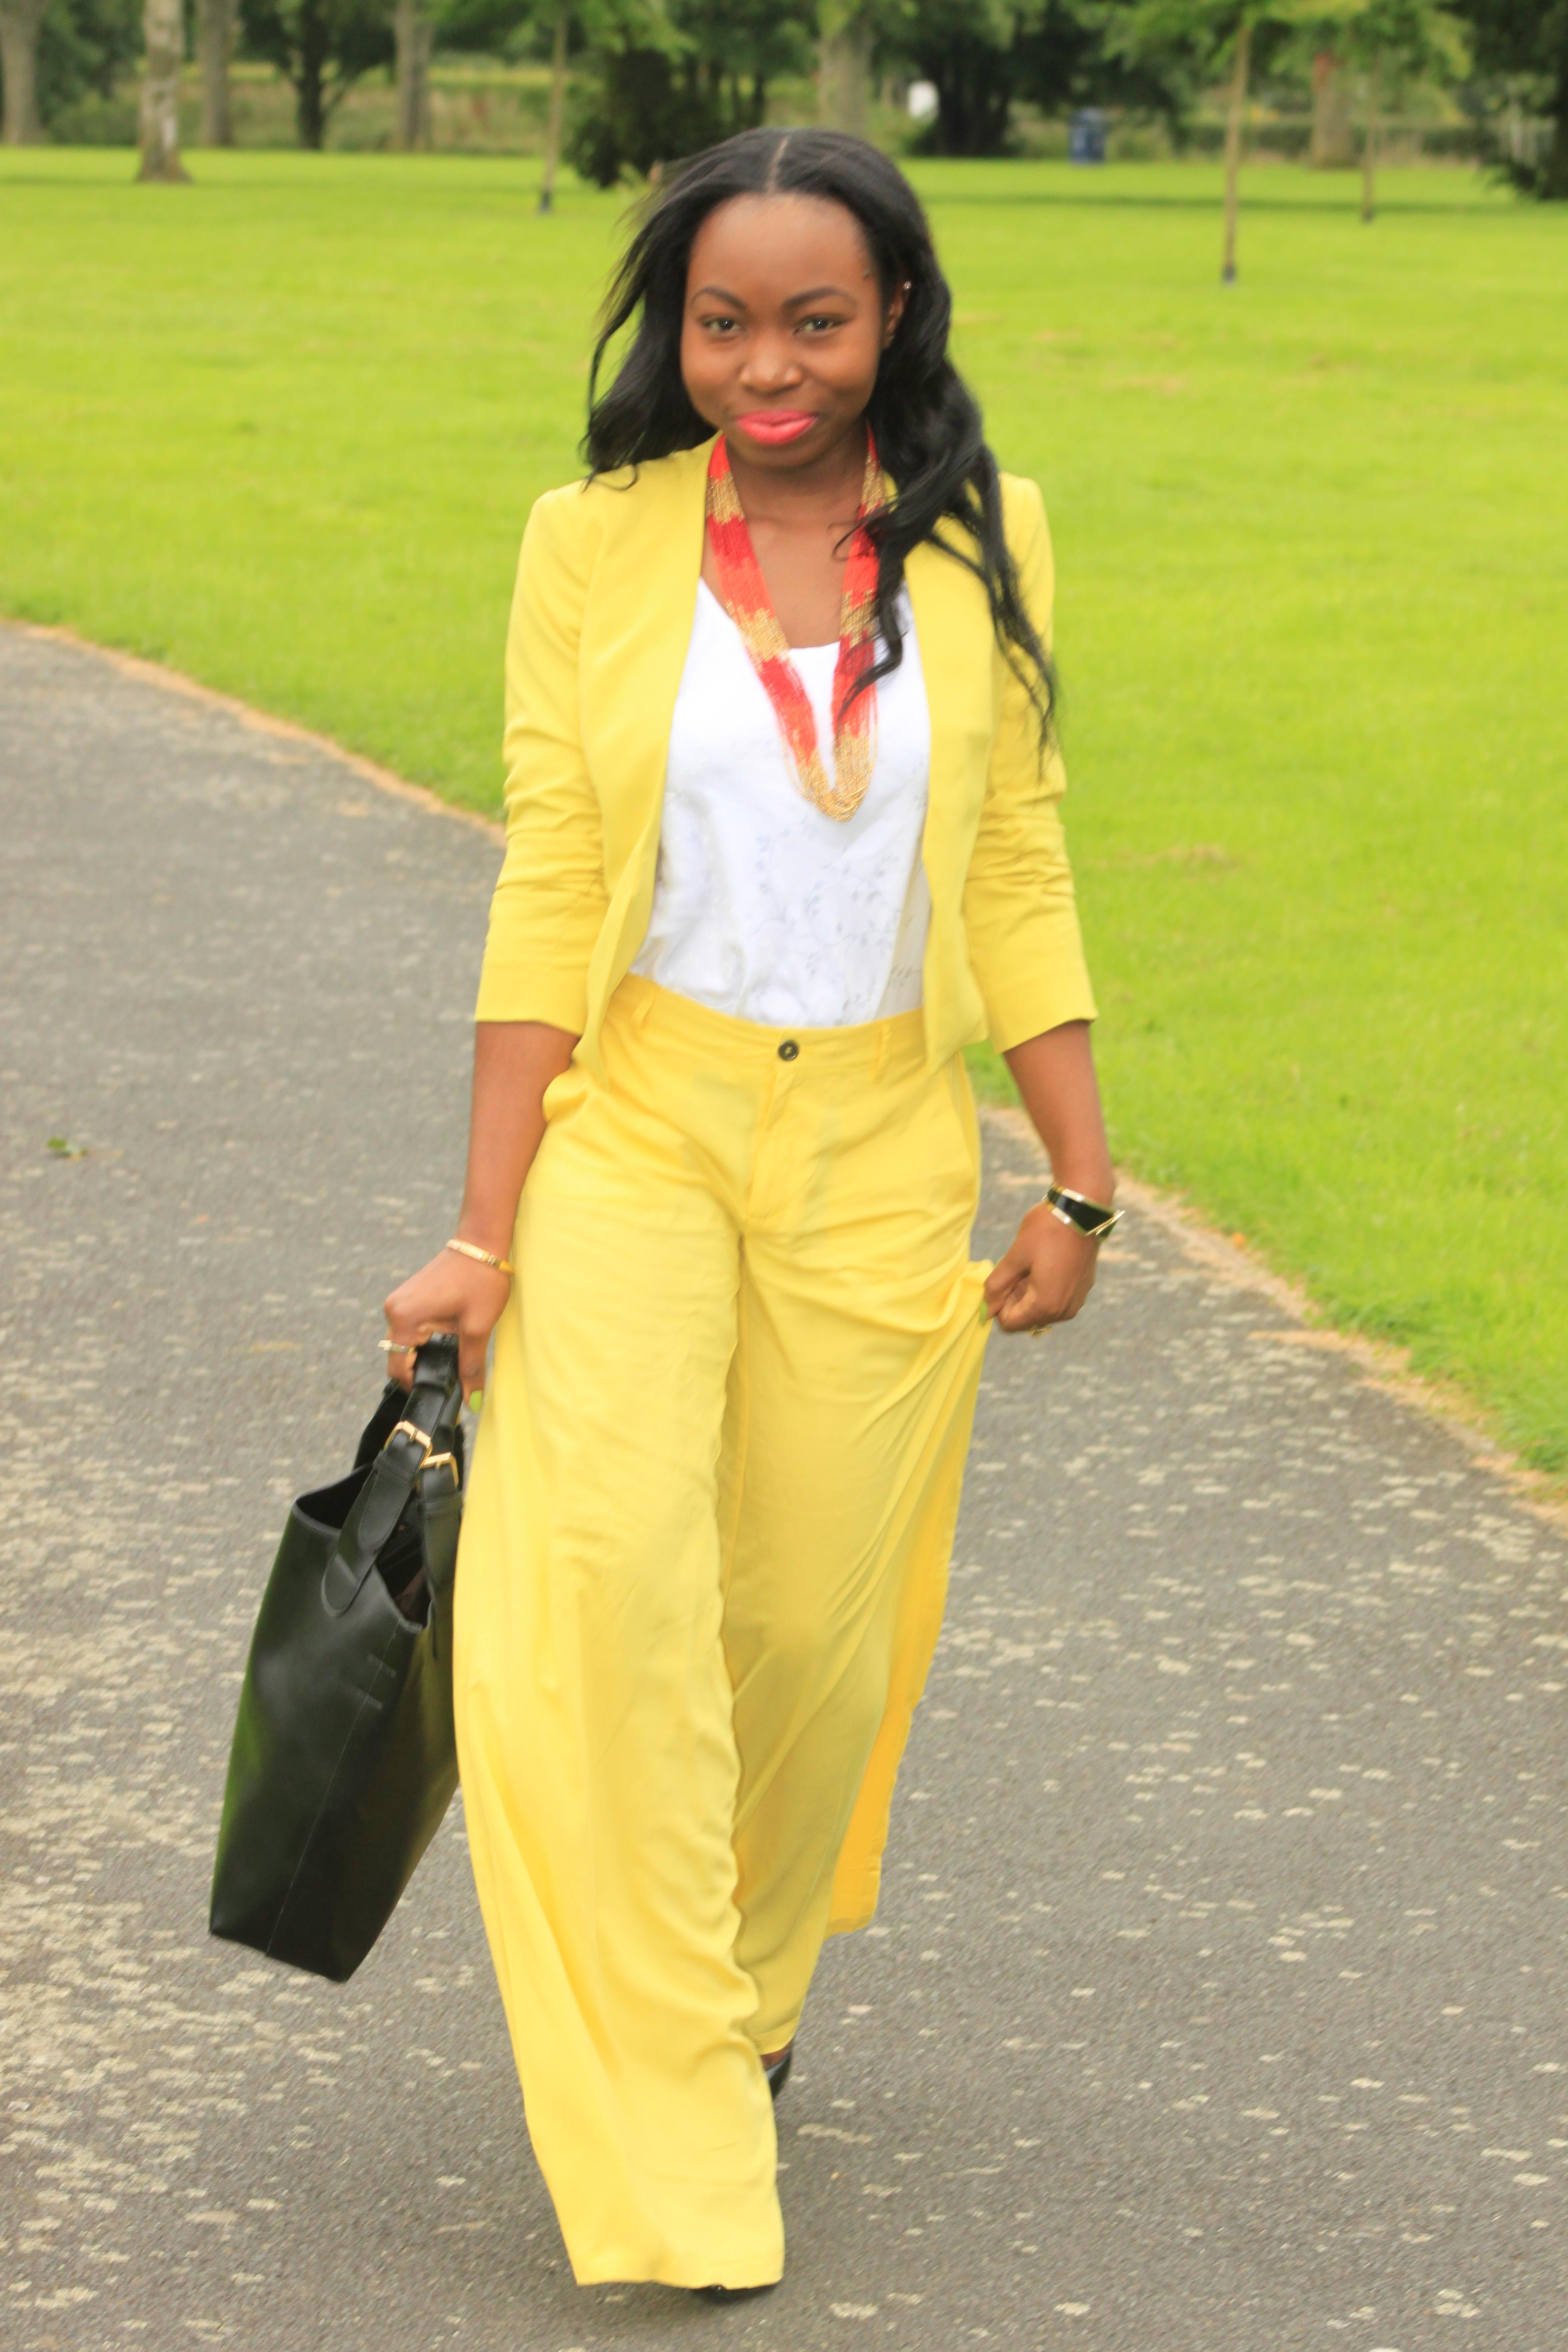 OOTD: Colour Me Yellow